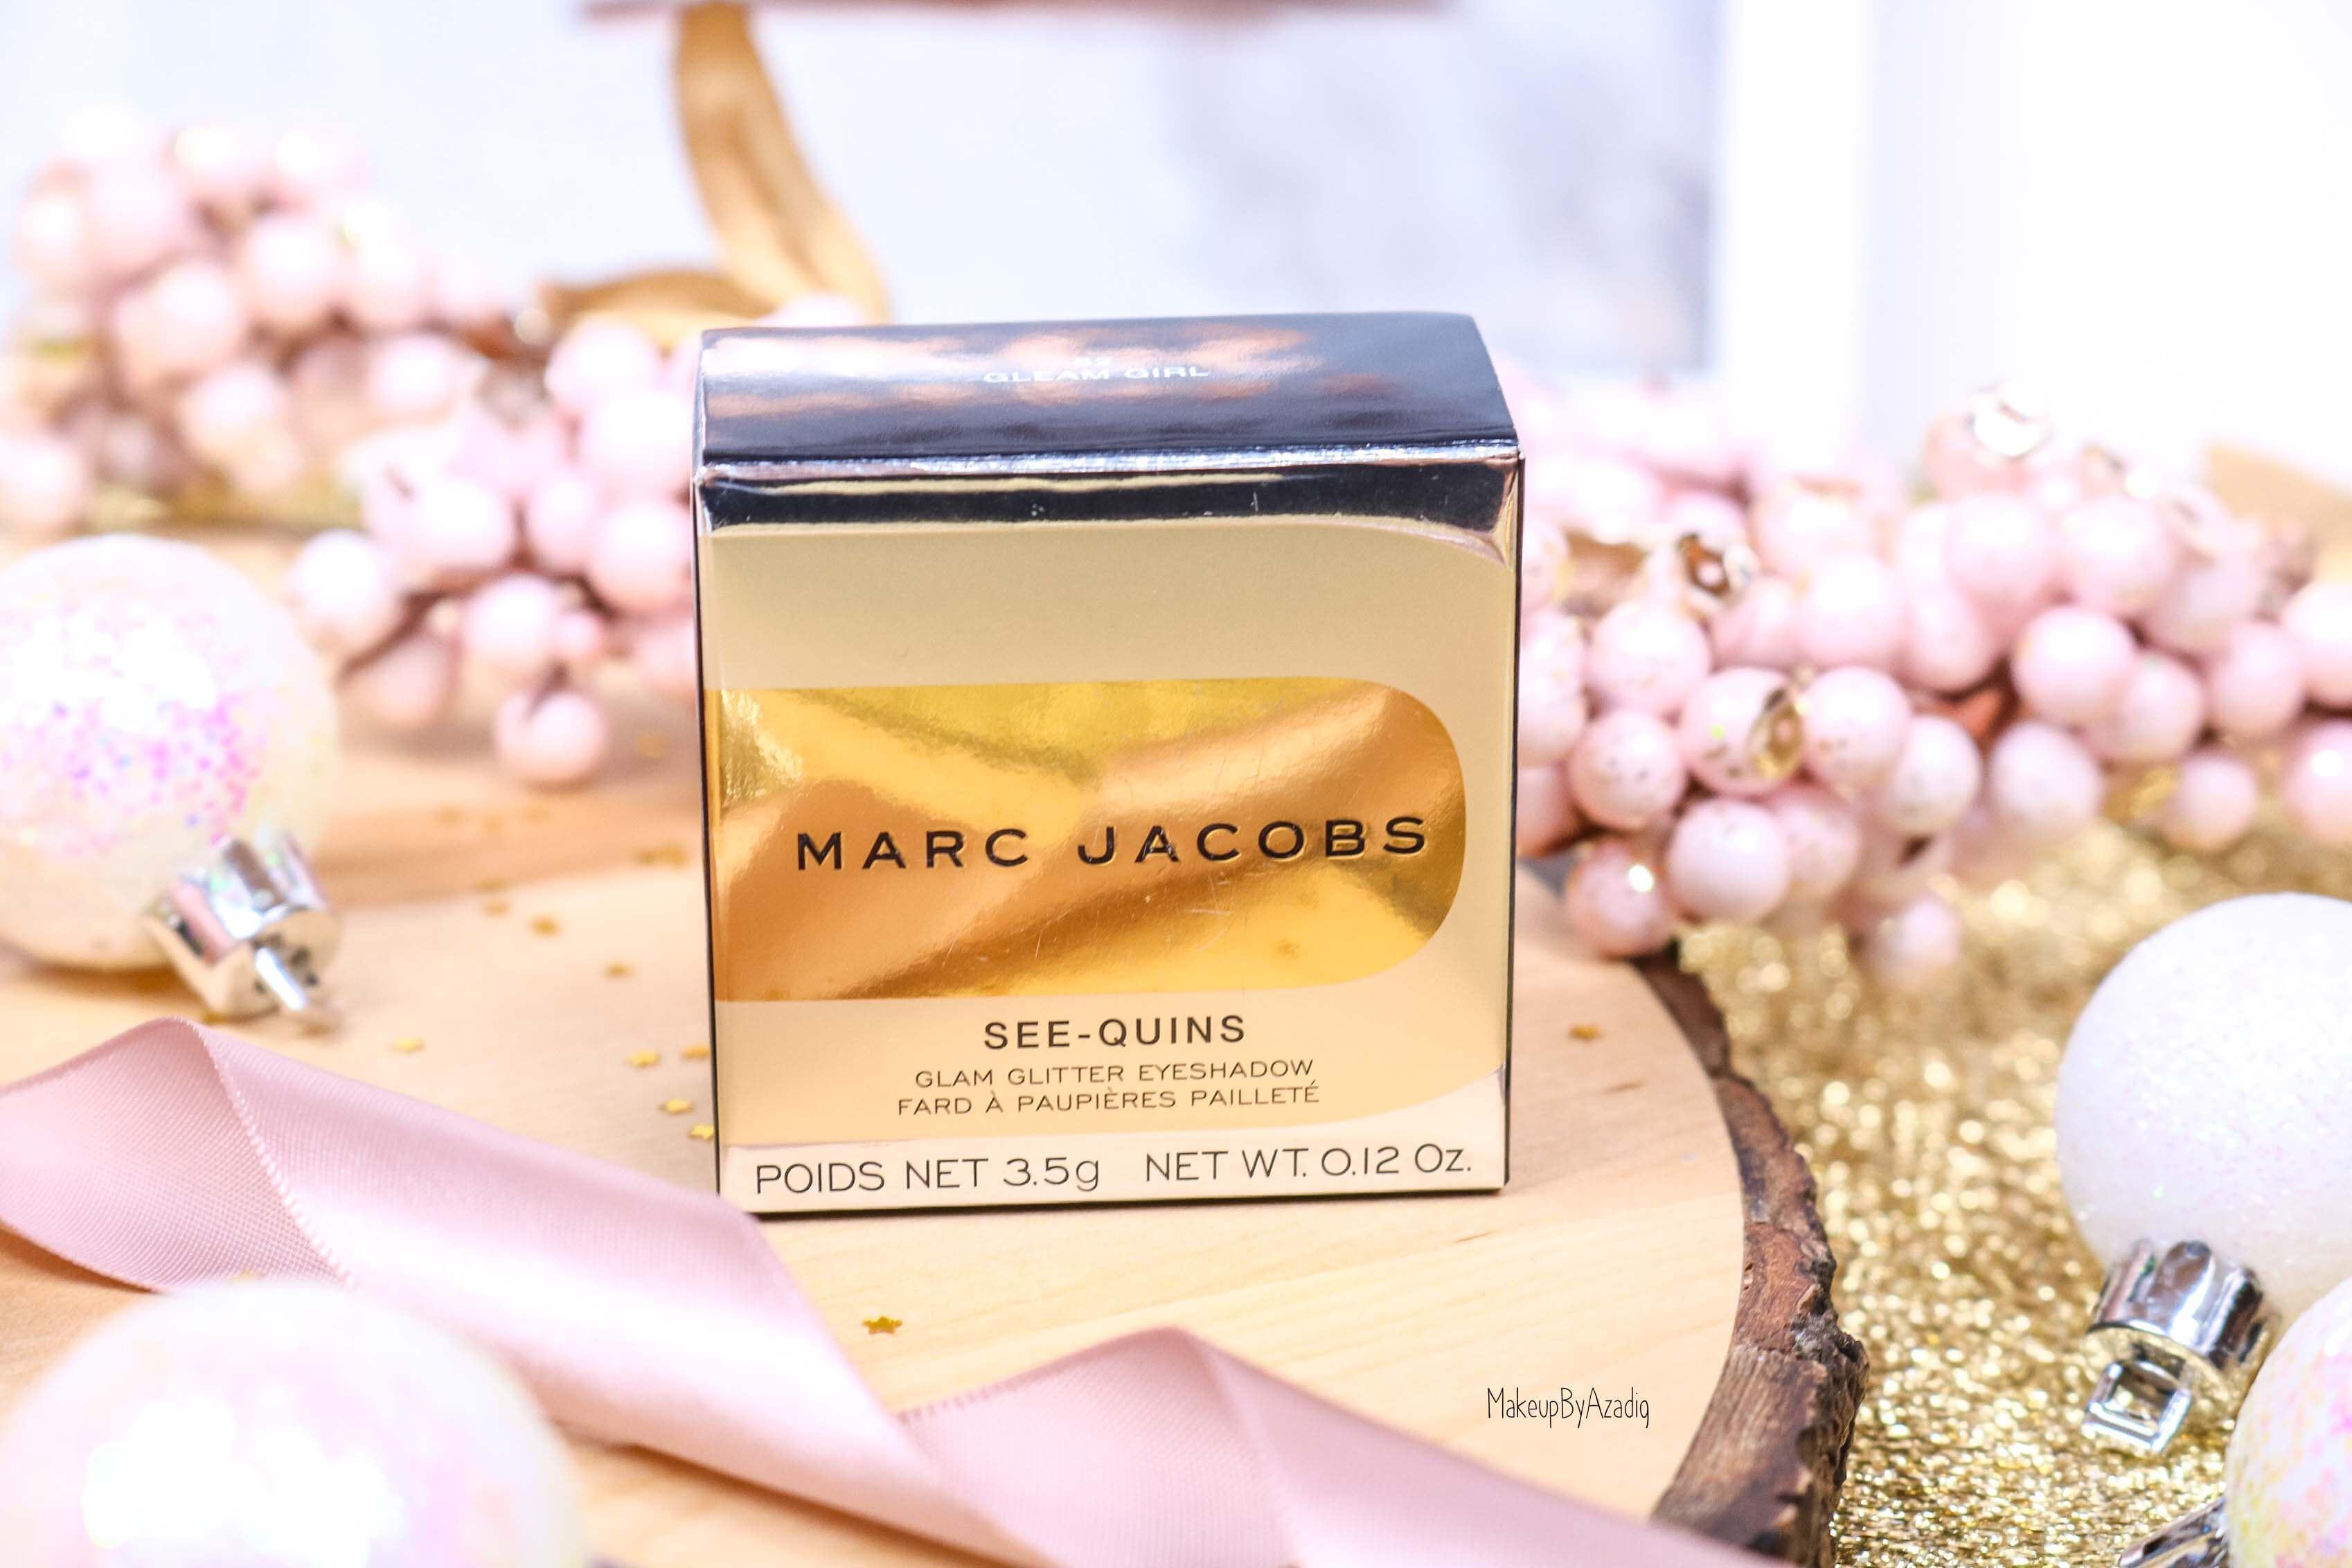 revue-fard-paupieres-paillete-marc-jacobs-beauty-gleam-girl-makeupbyazadig-avis-prix-swatch-gold